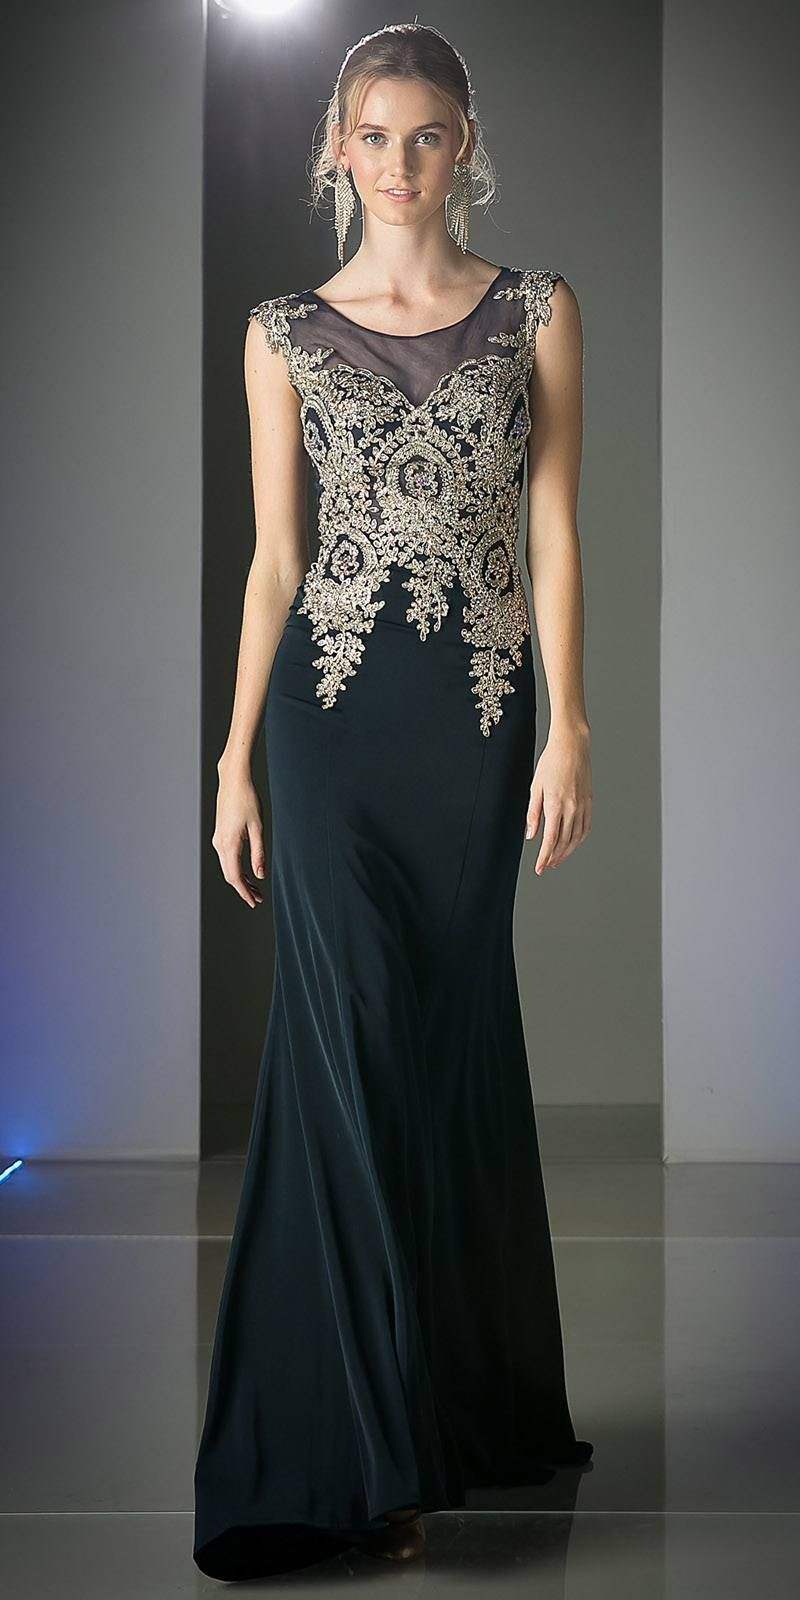 Cinderella Divine 35 Illusion Bateau Neck Embroidered Bodice Black Floor Length Prom Dress